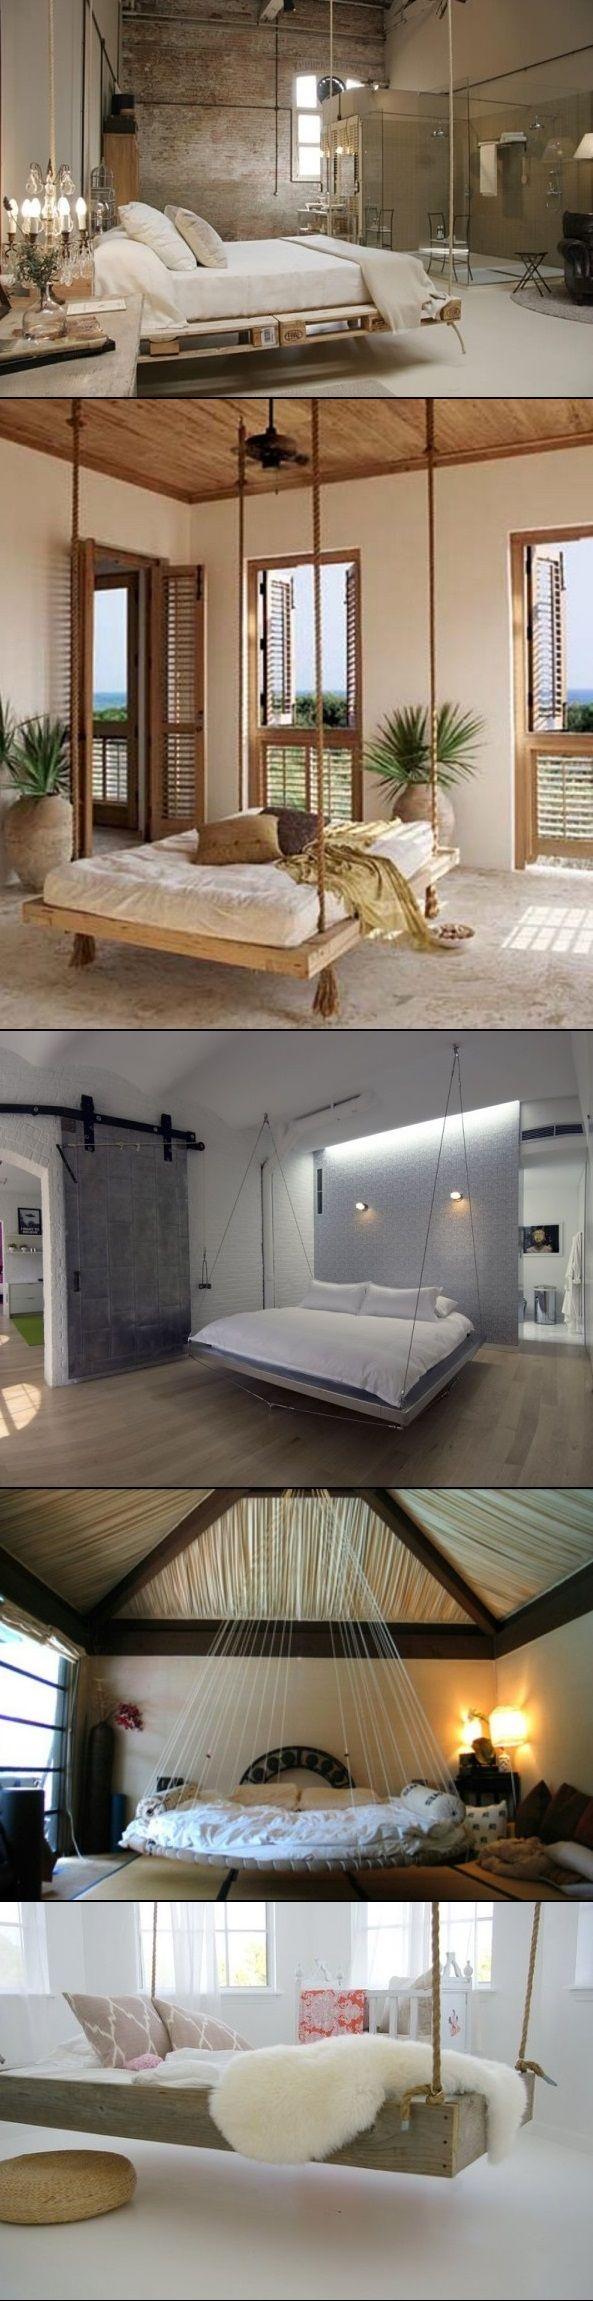 camas con palets14